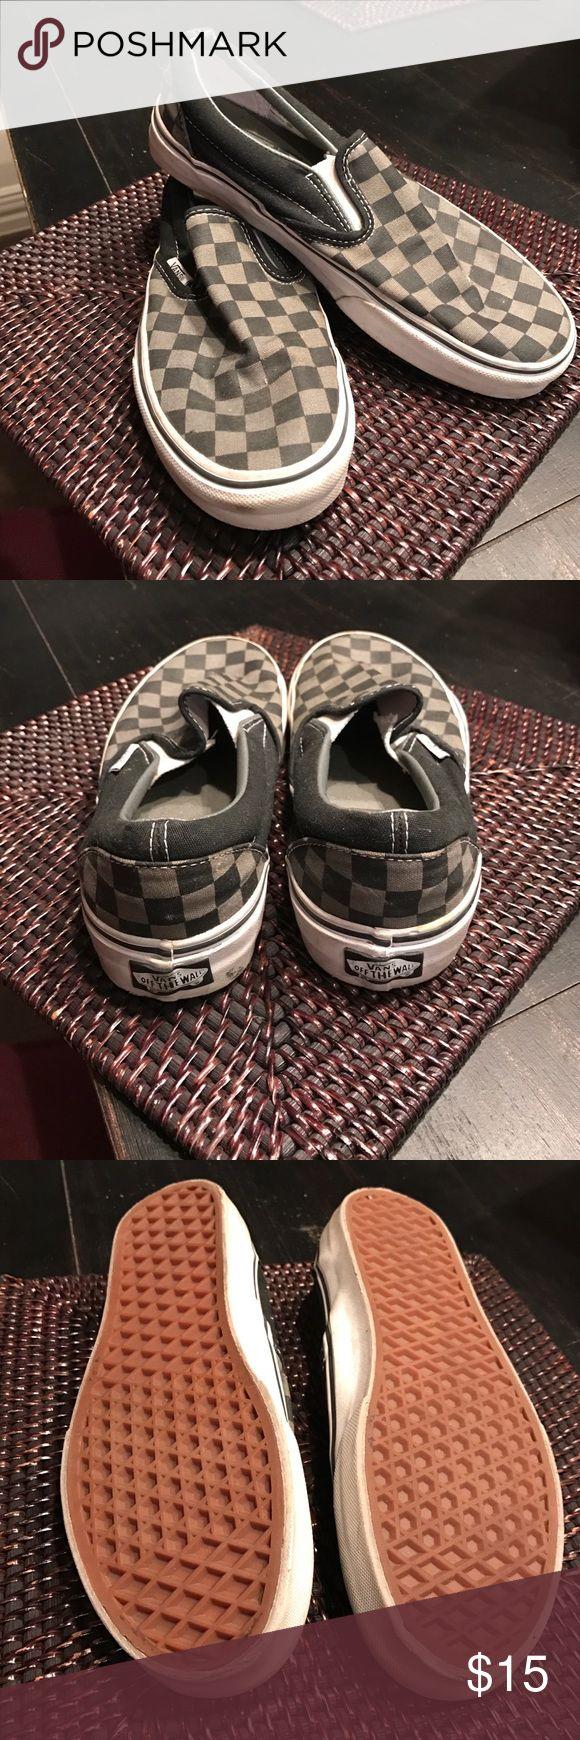 Vans Checkerboard Slip-On Tennis Shoe. Black/Pewter Checkerboard Vans Slip-On's. These are apart of my Vans collection. Lightly worn. Rubber sole. Vans Shoes Sneakers